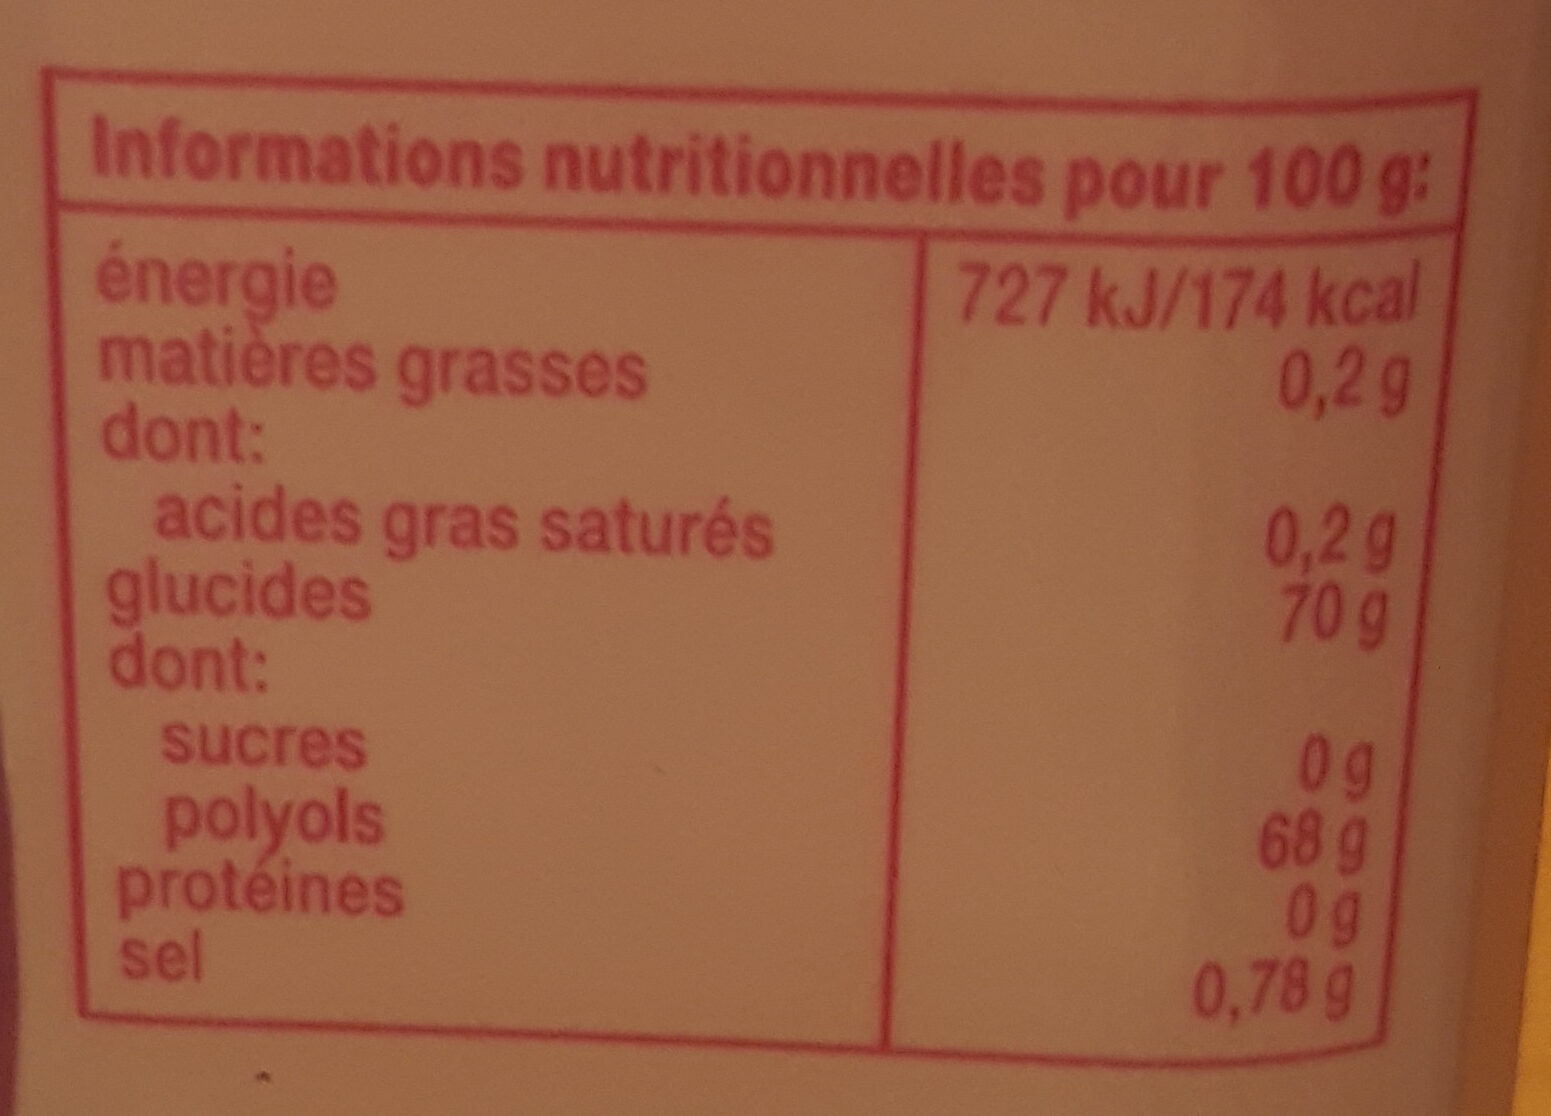 Mentos White - Informations nutritionnelles